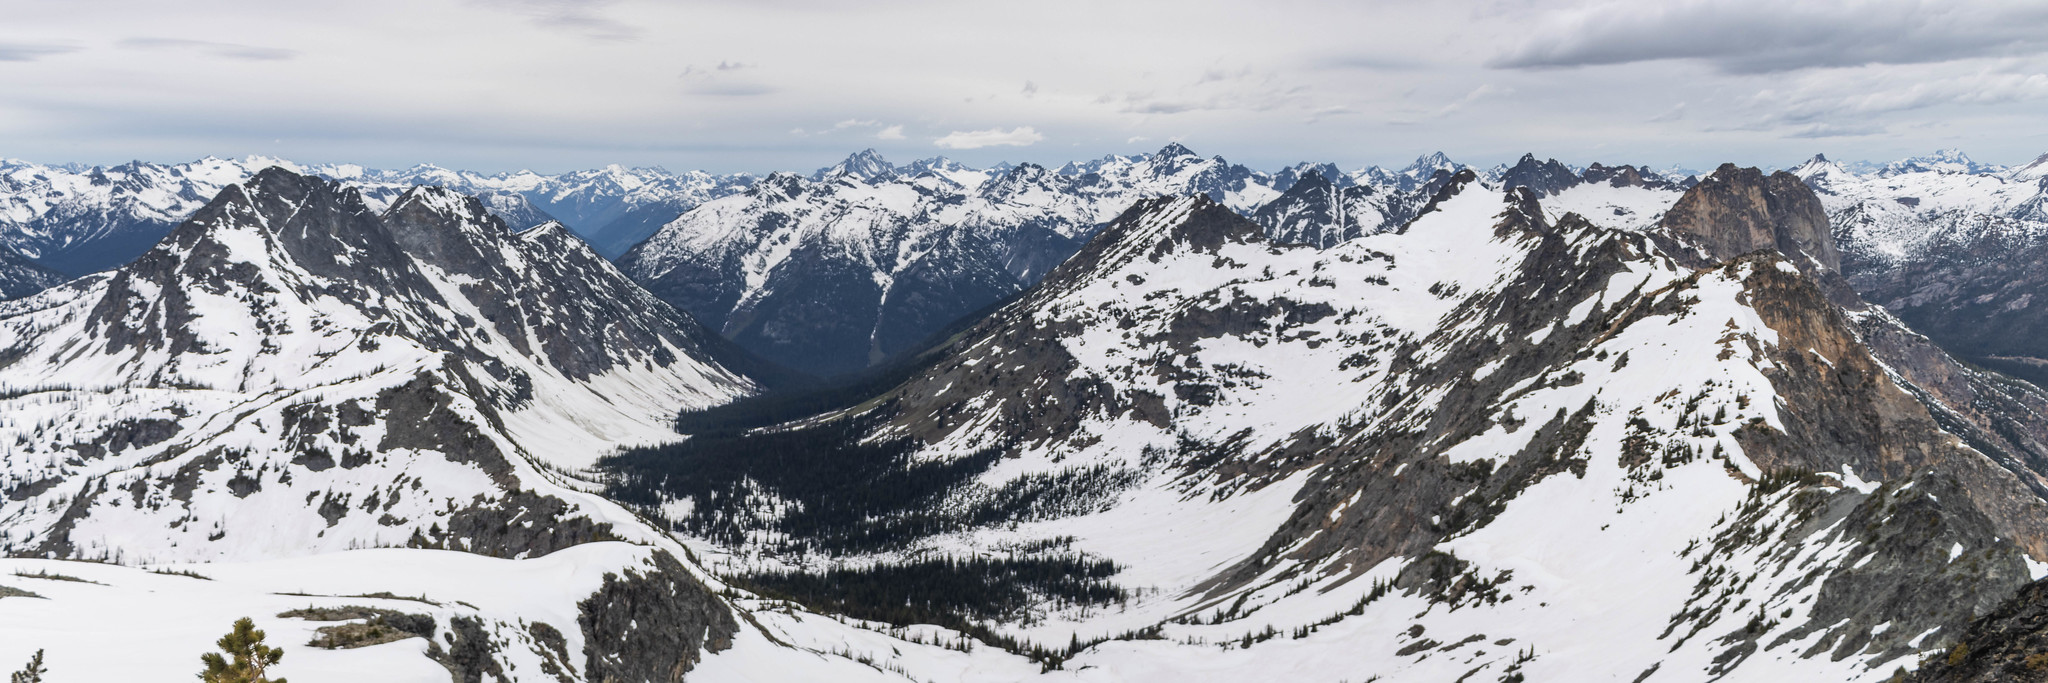 Western panoramic view